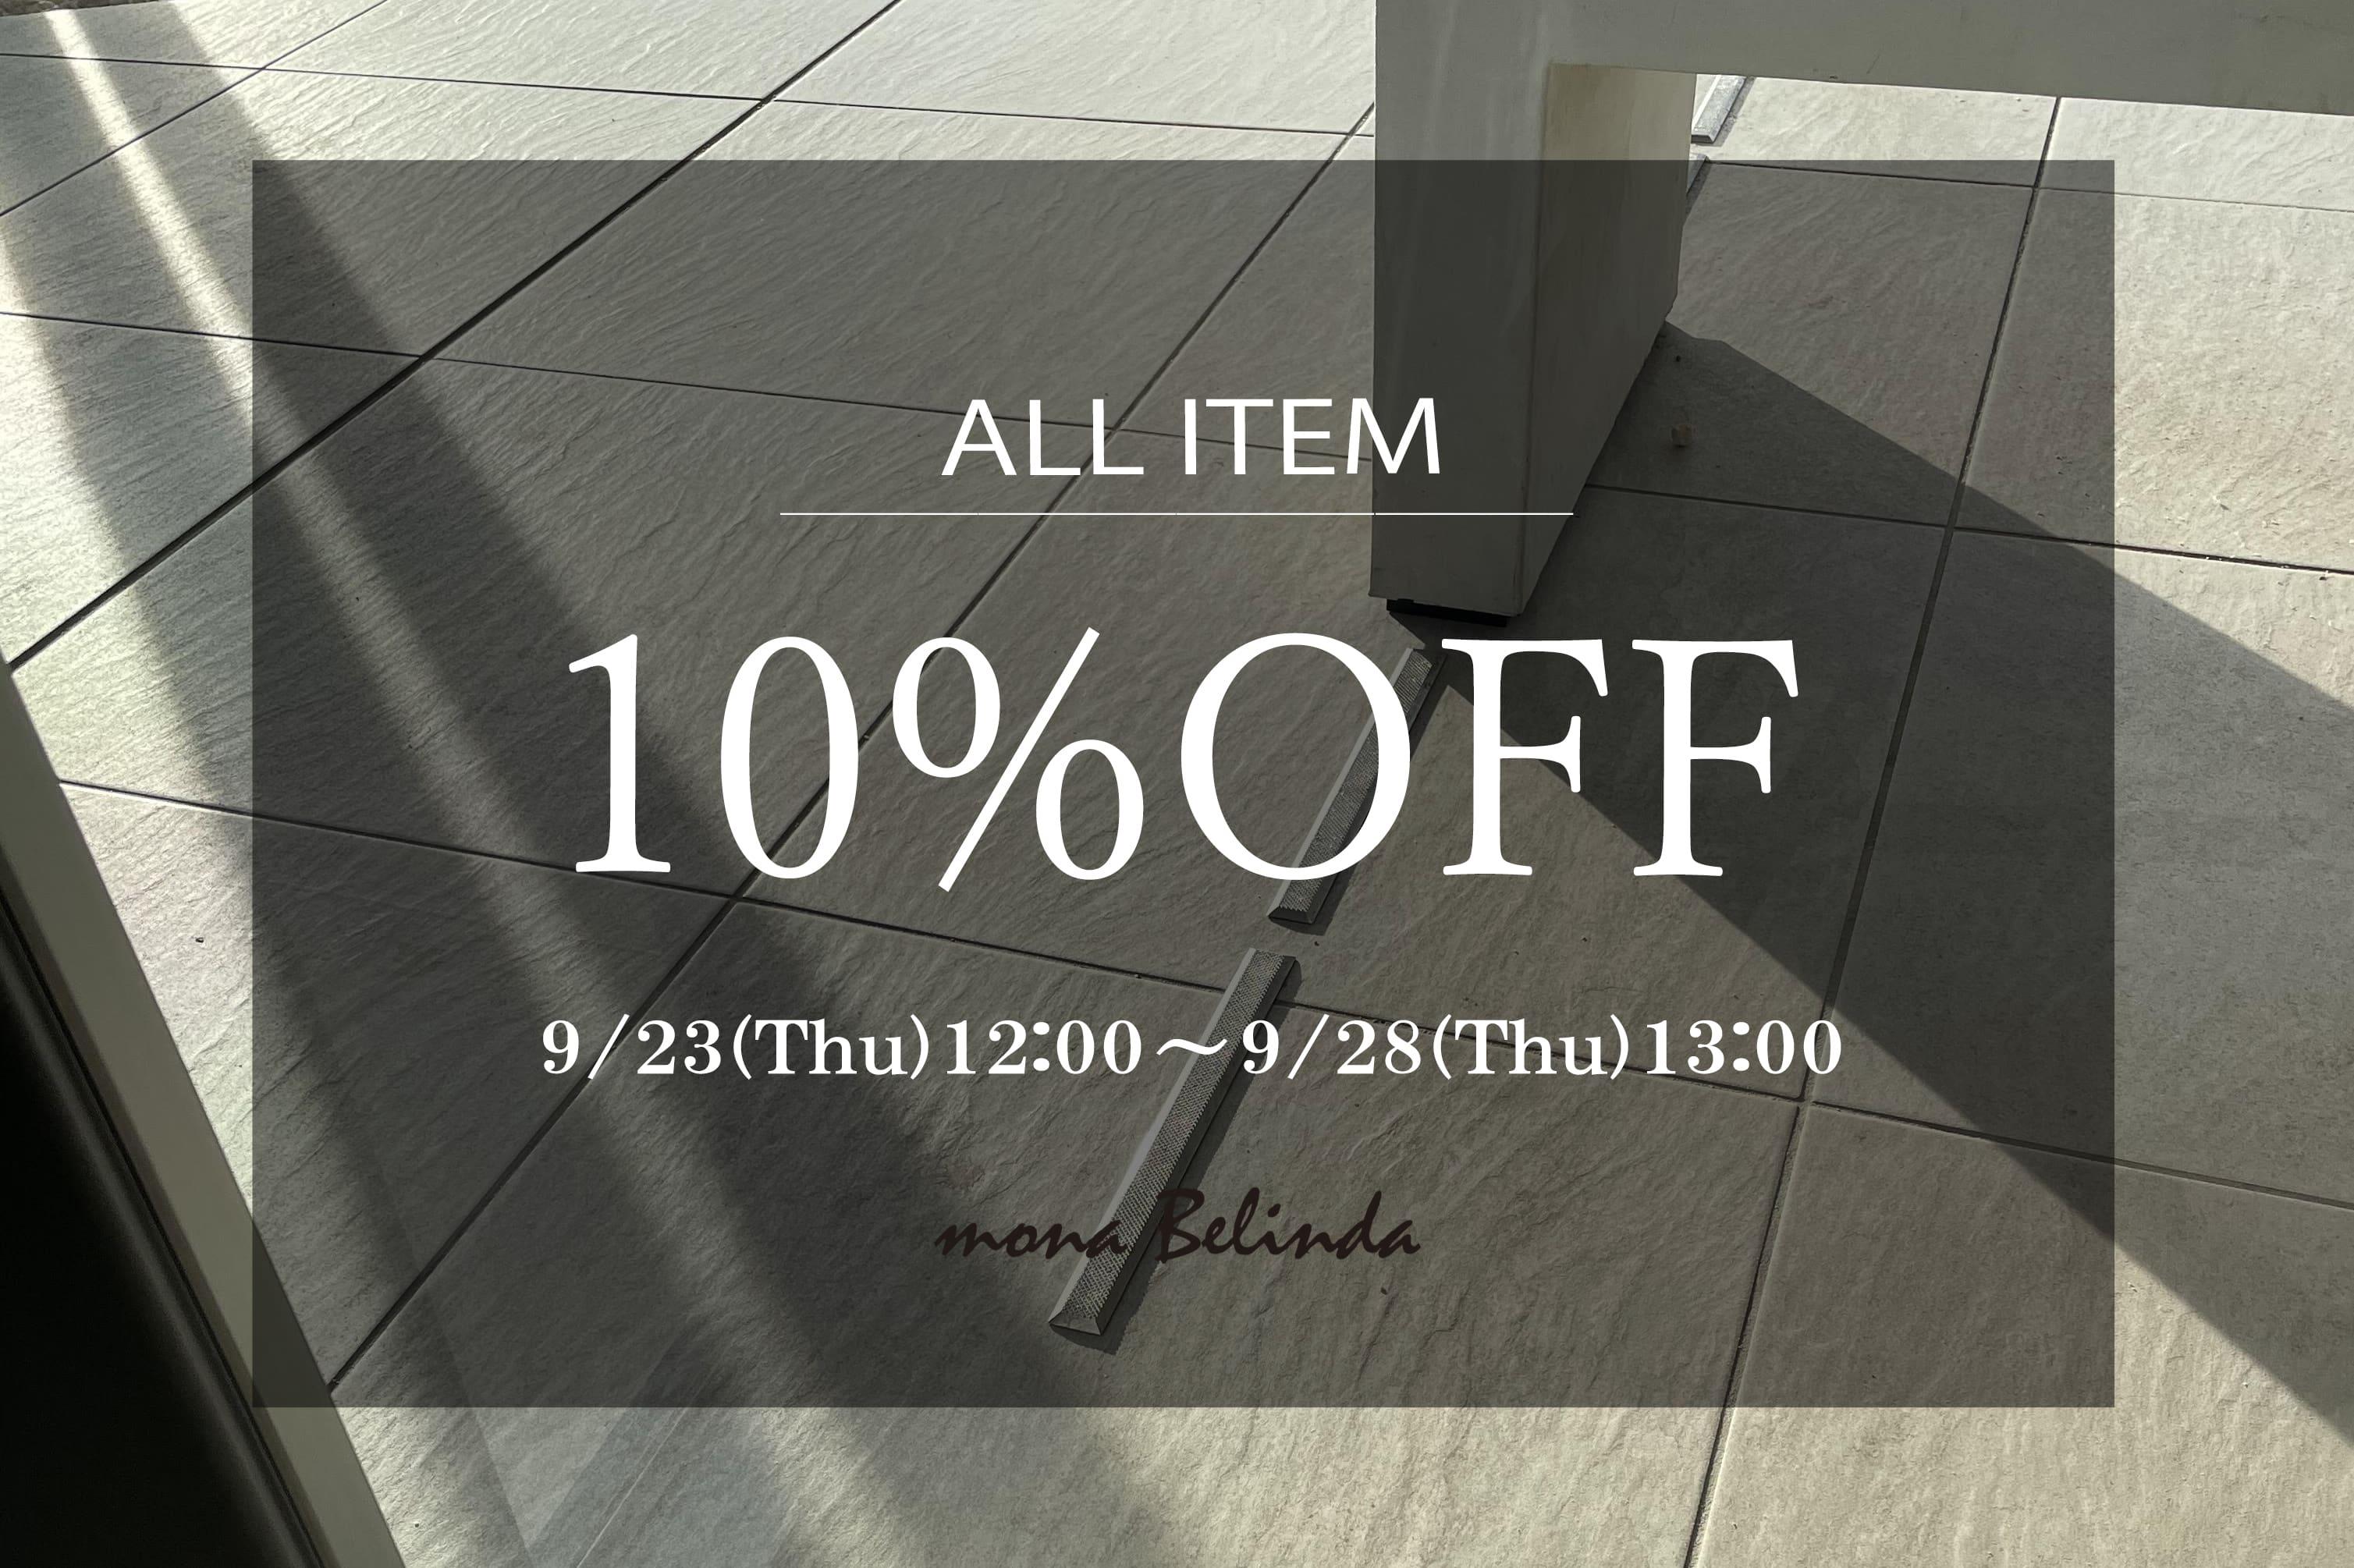 mona Belinda 【期間限定】全品10%OFFのタイムセール開催!